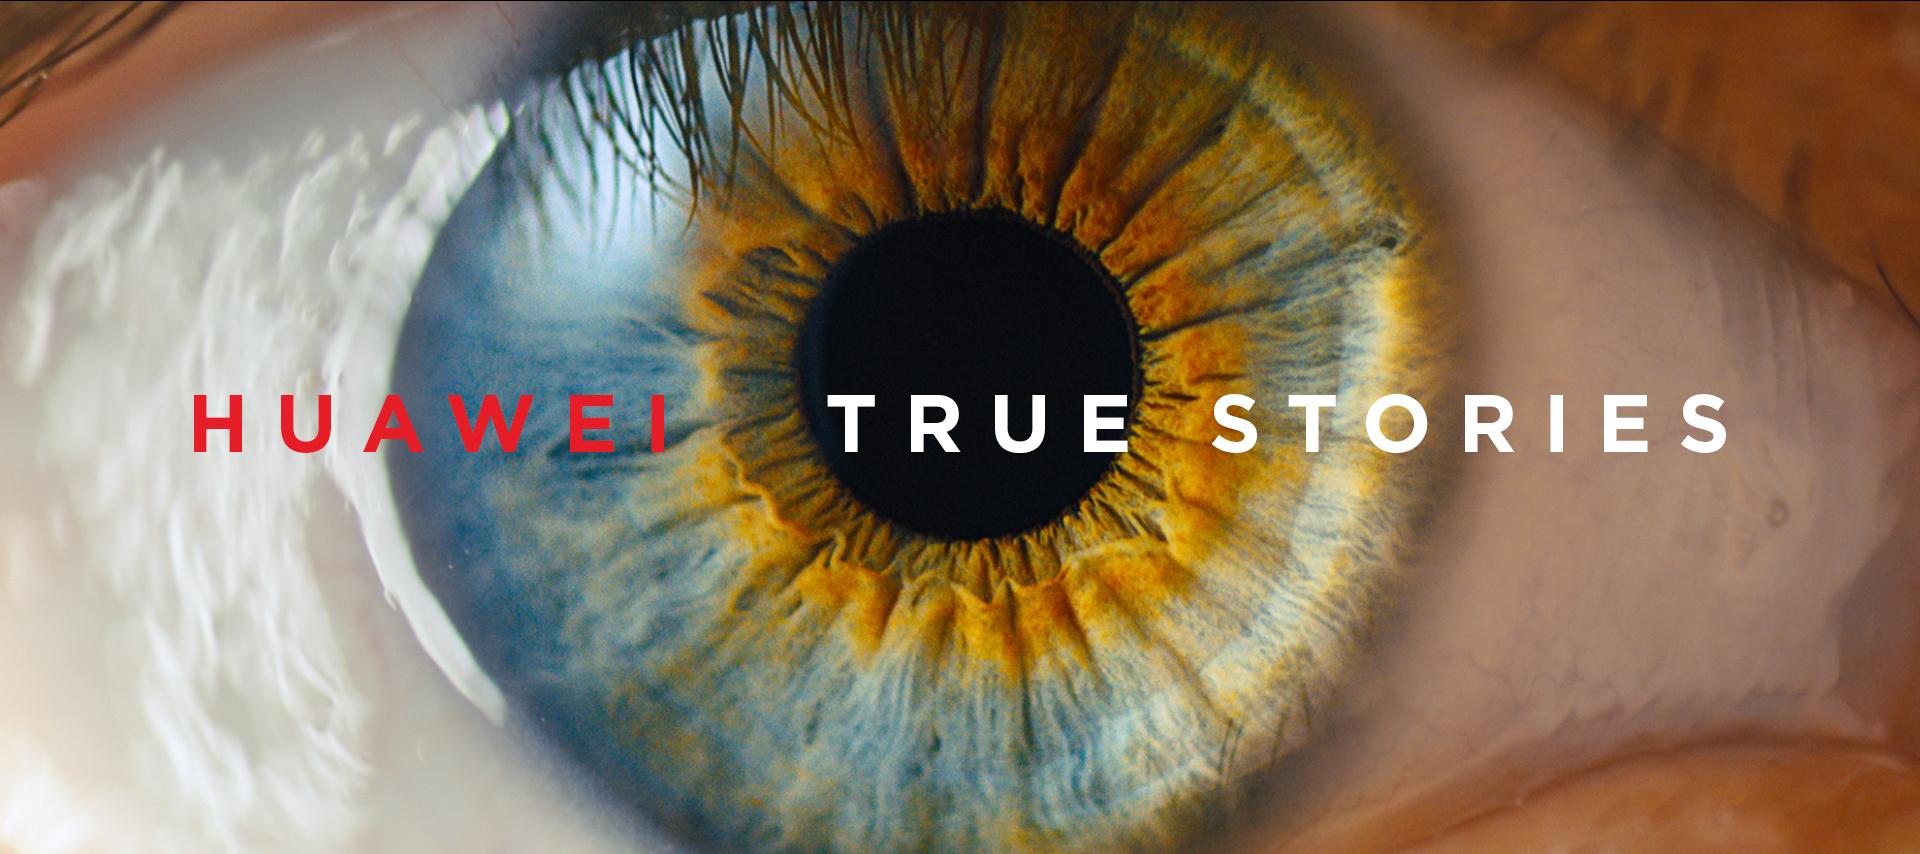 Huawei True Stories